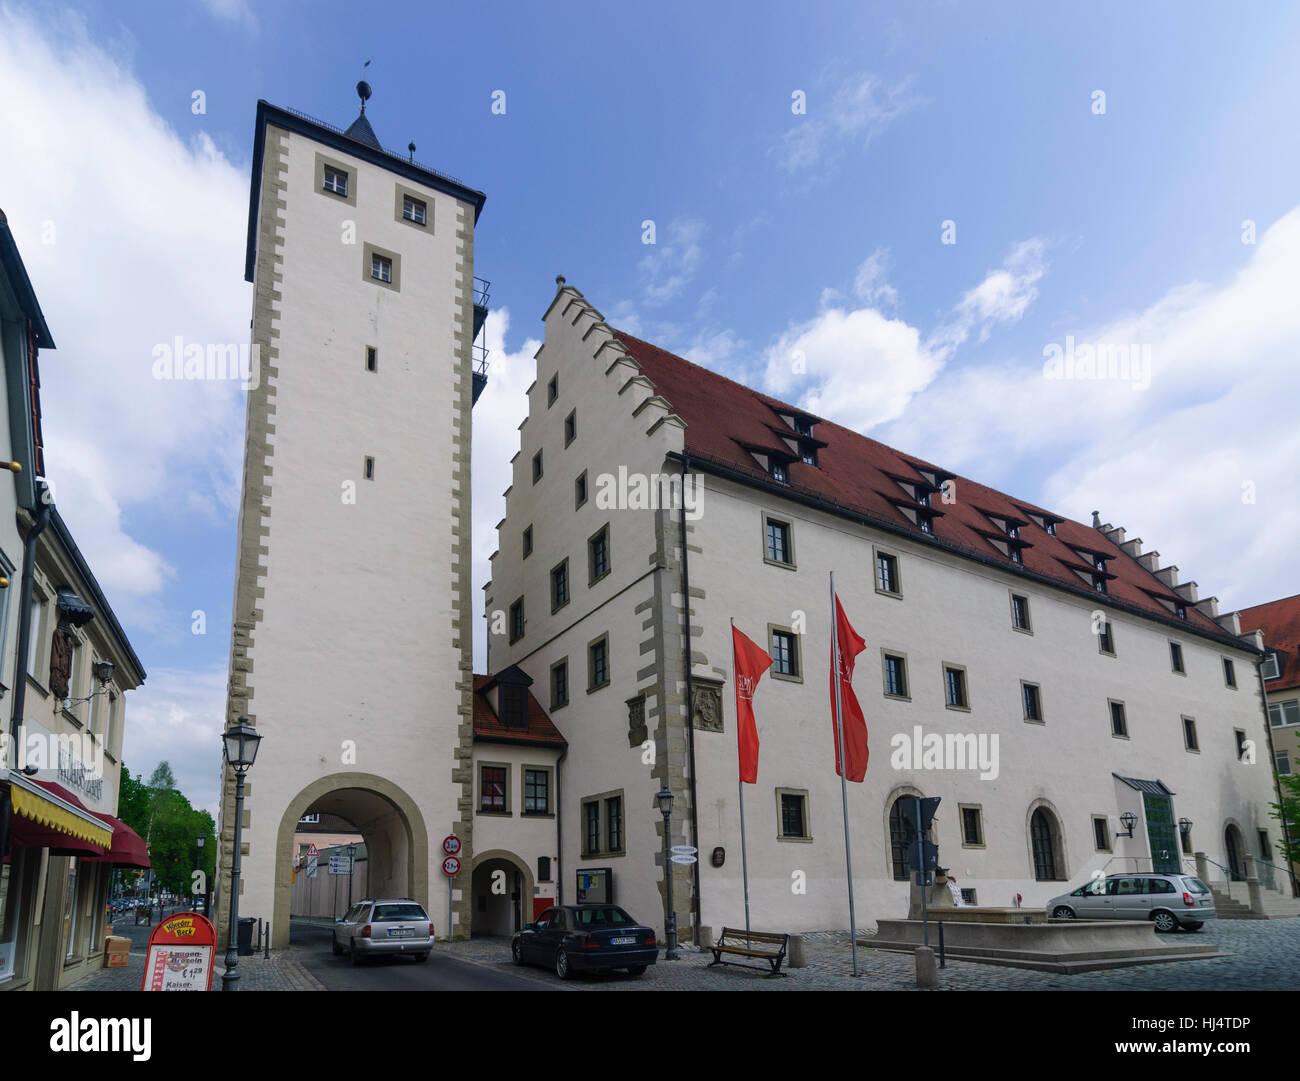 Hassfurt Stockfotos & Hassfurt Bilder - Alamy